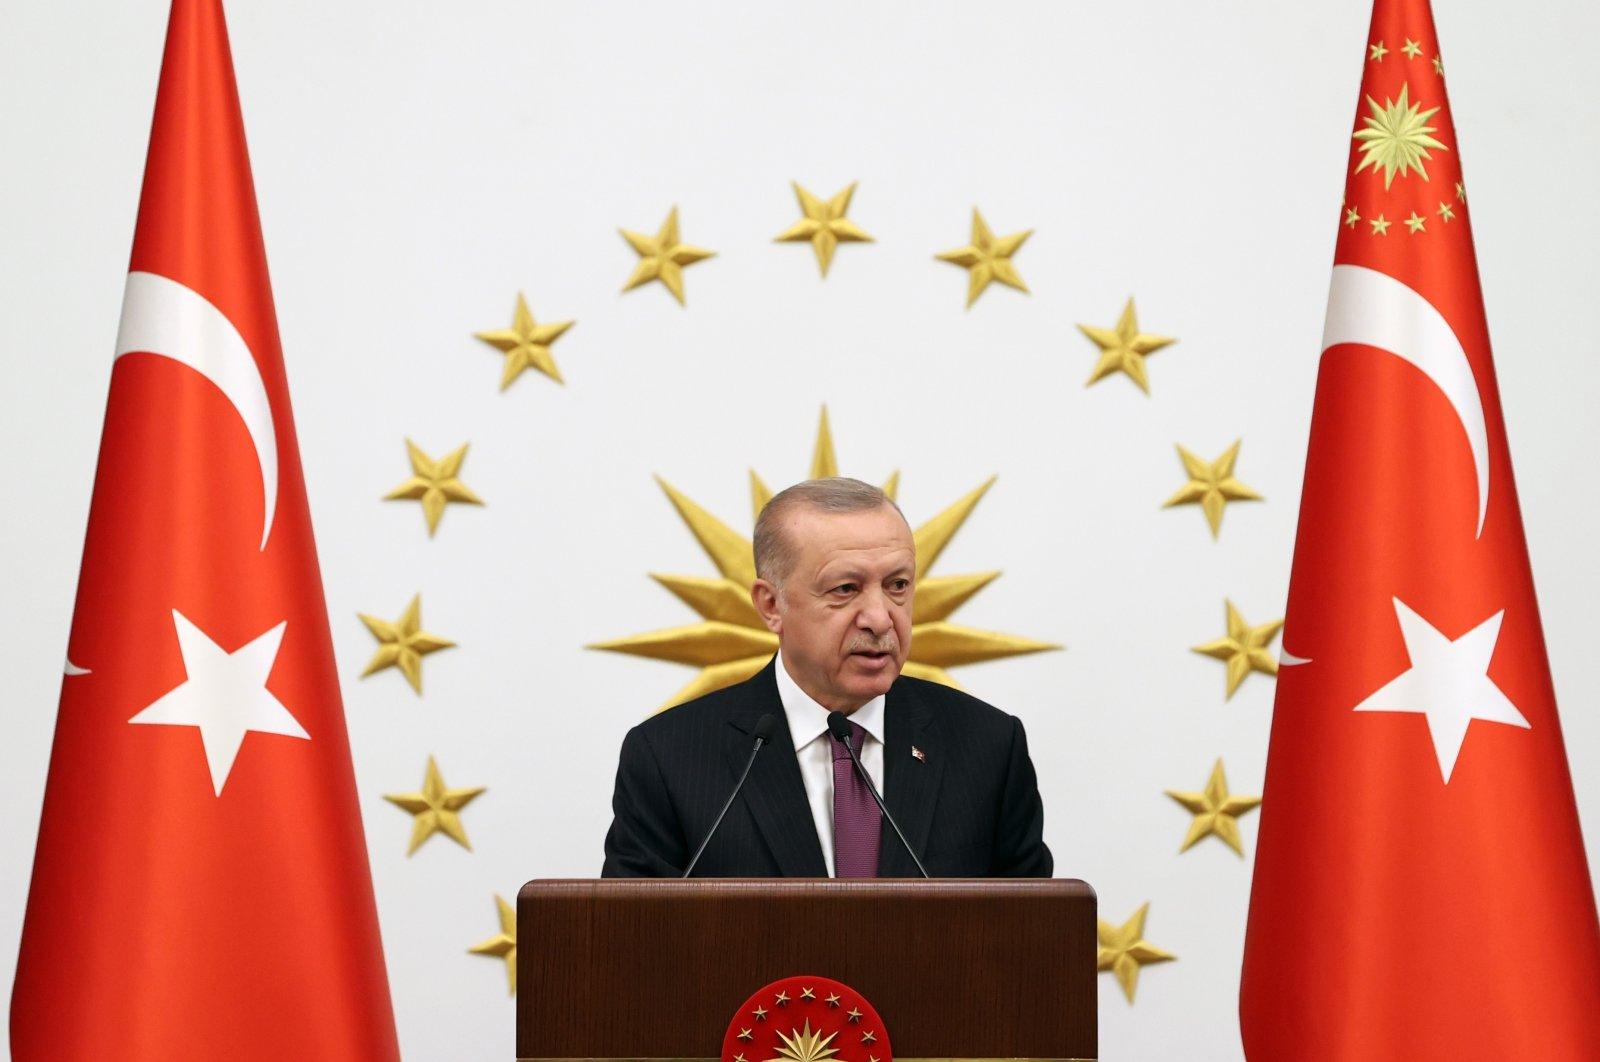 President Recep Tayyip Erdoğan speaks during a reception at the Presidential Complex on Aug. 23, 2021 (IHA Photo)